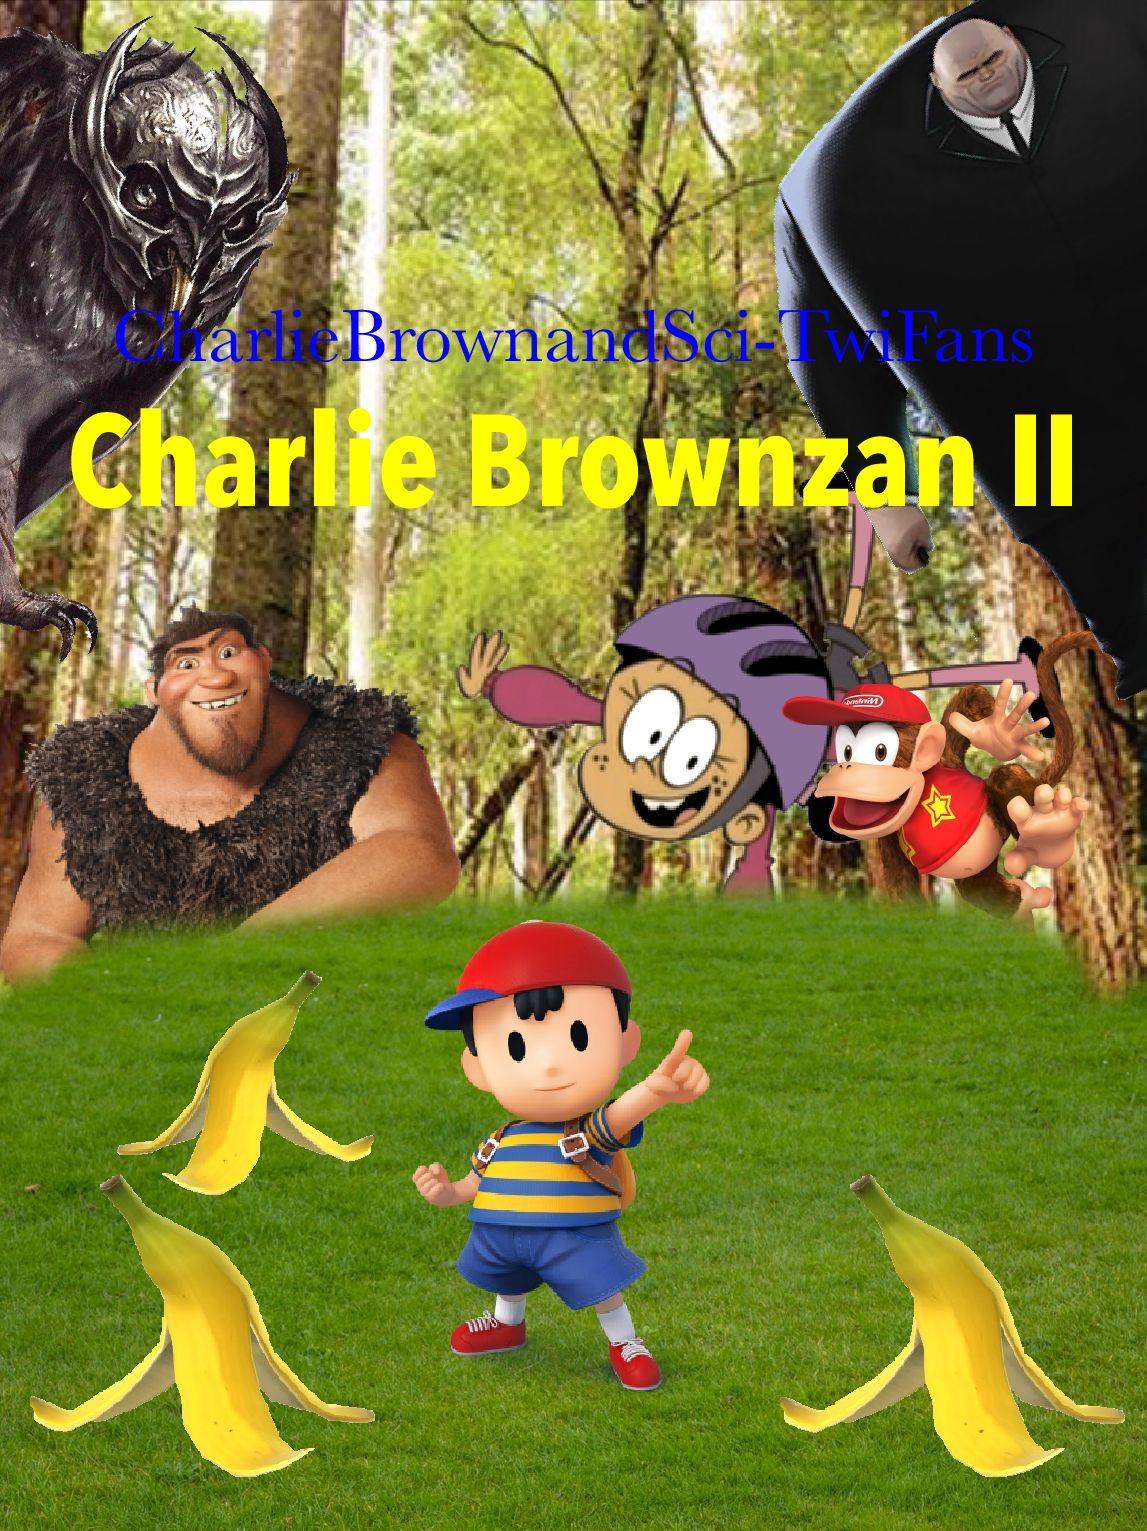 Charlie Brownzan II (2005)